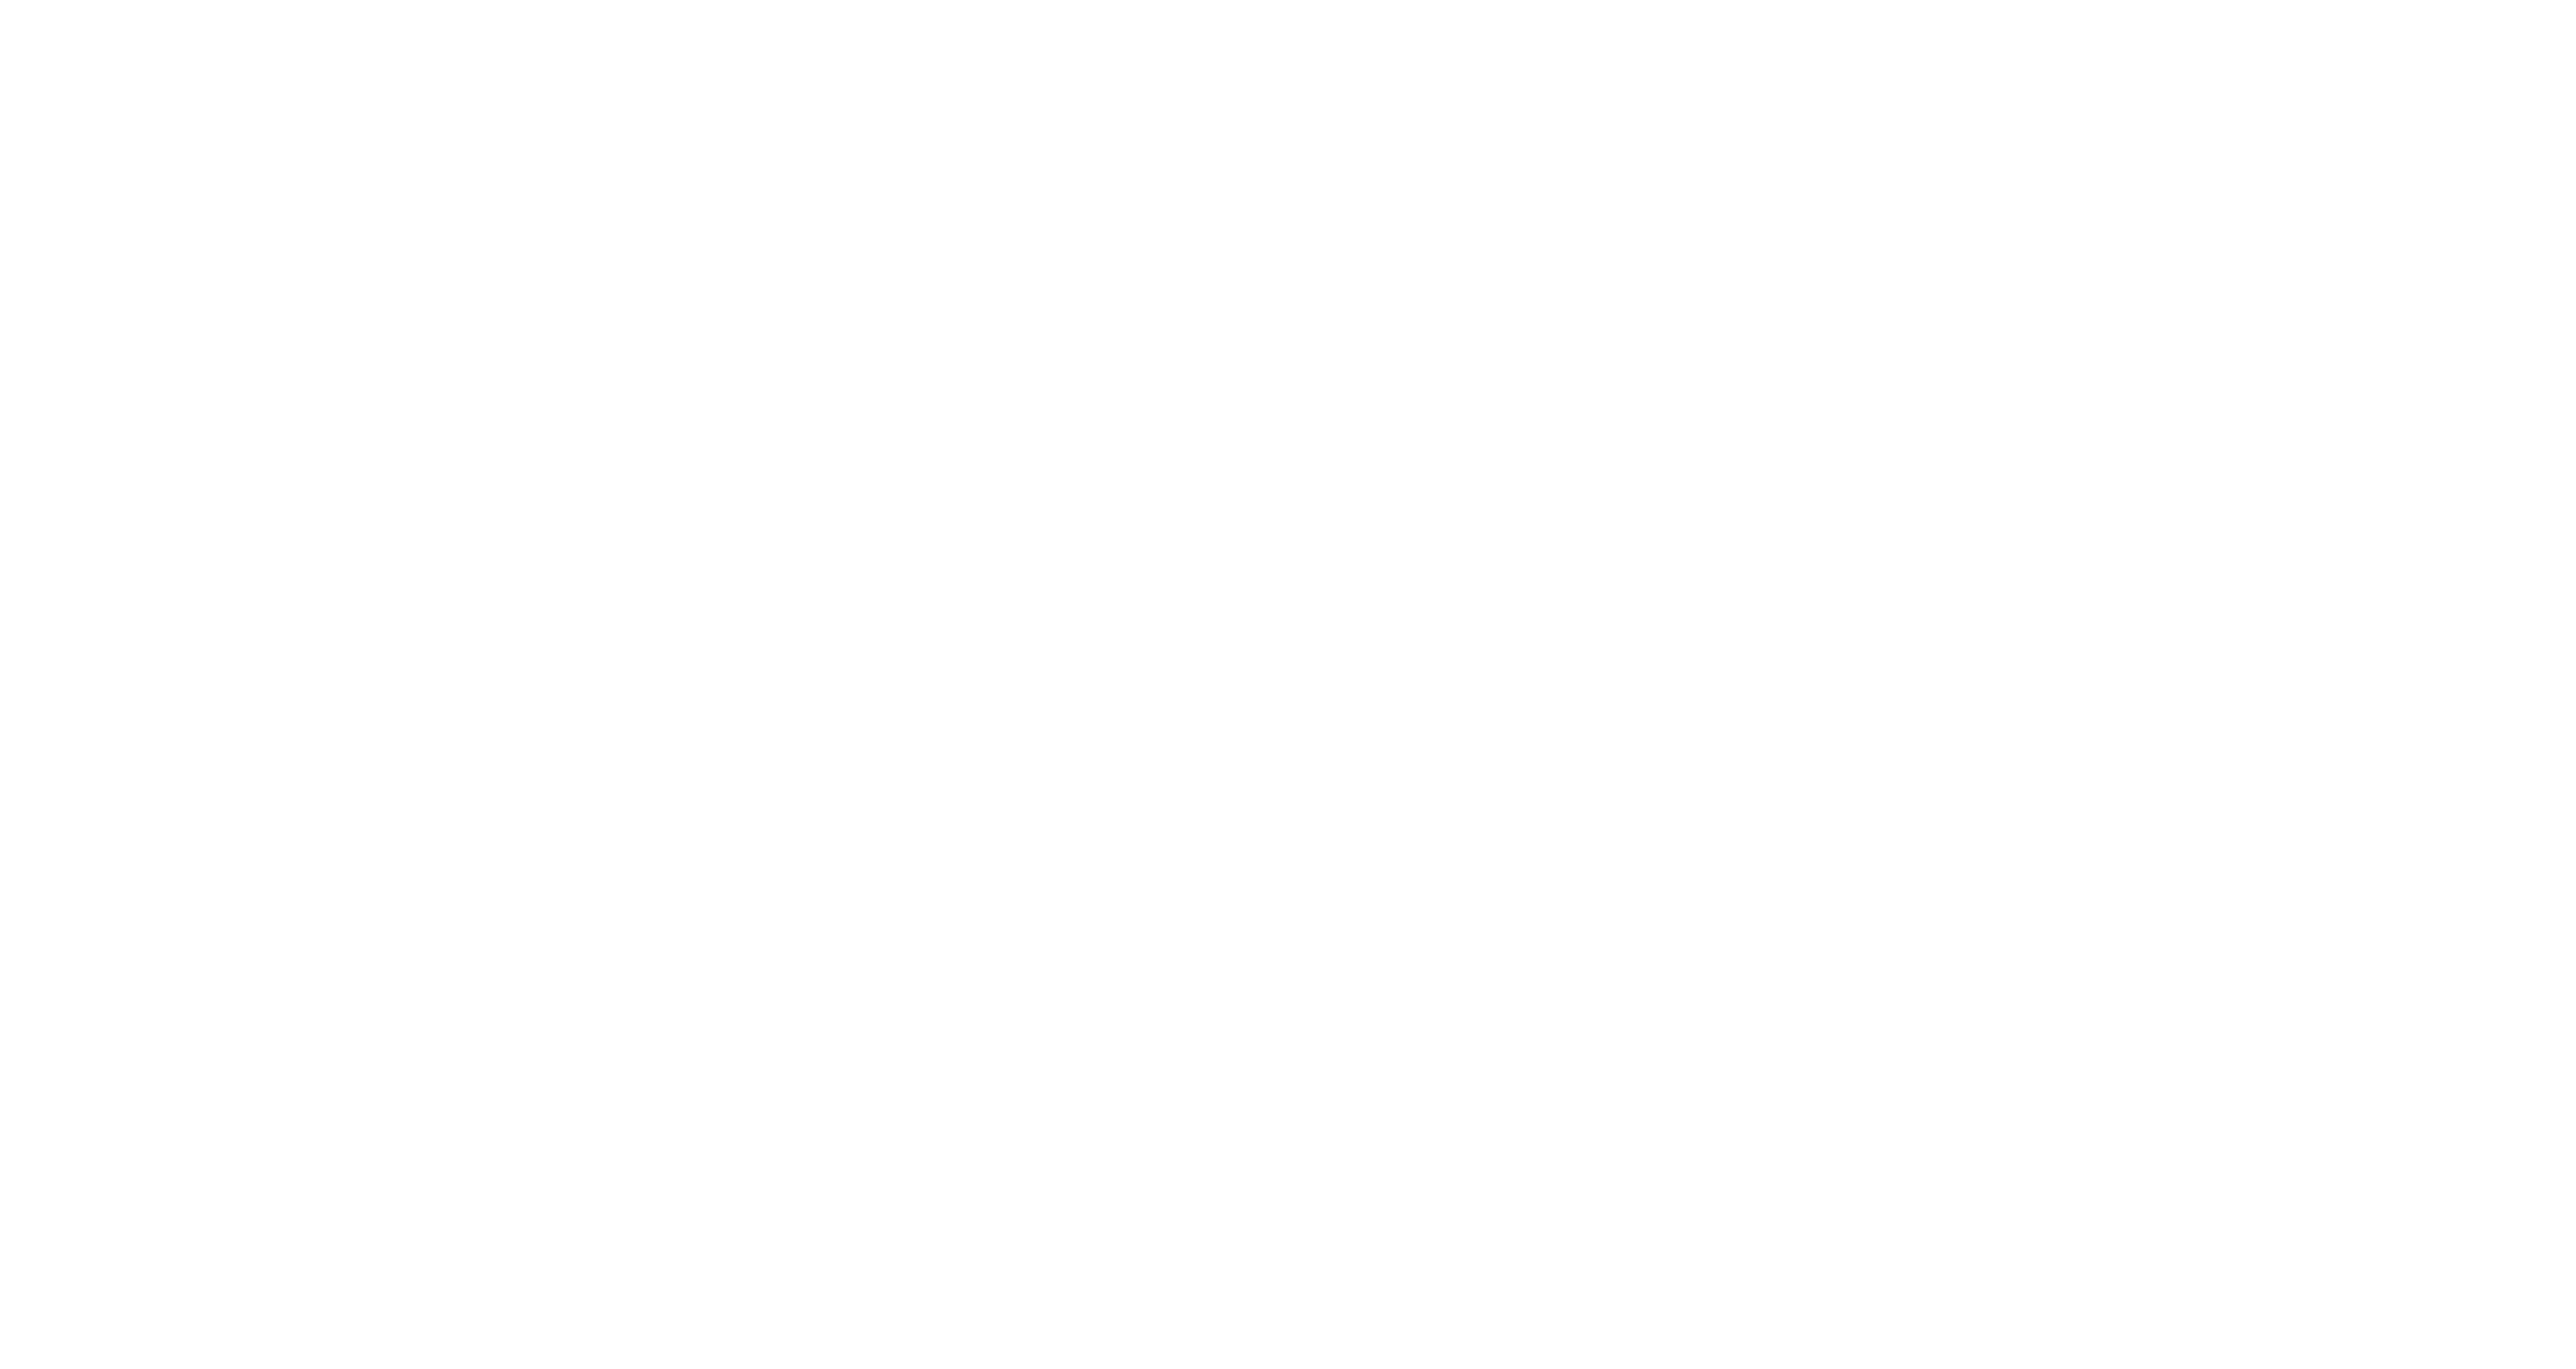 Raymond Thornton